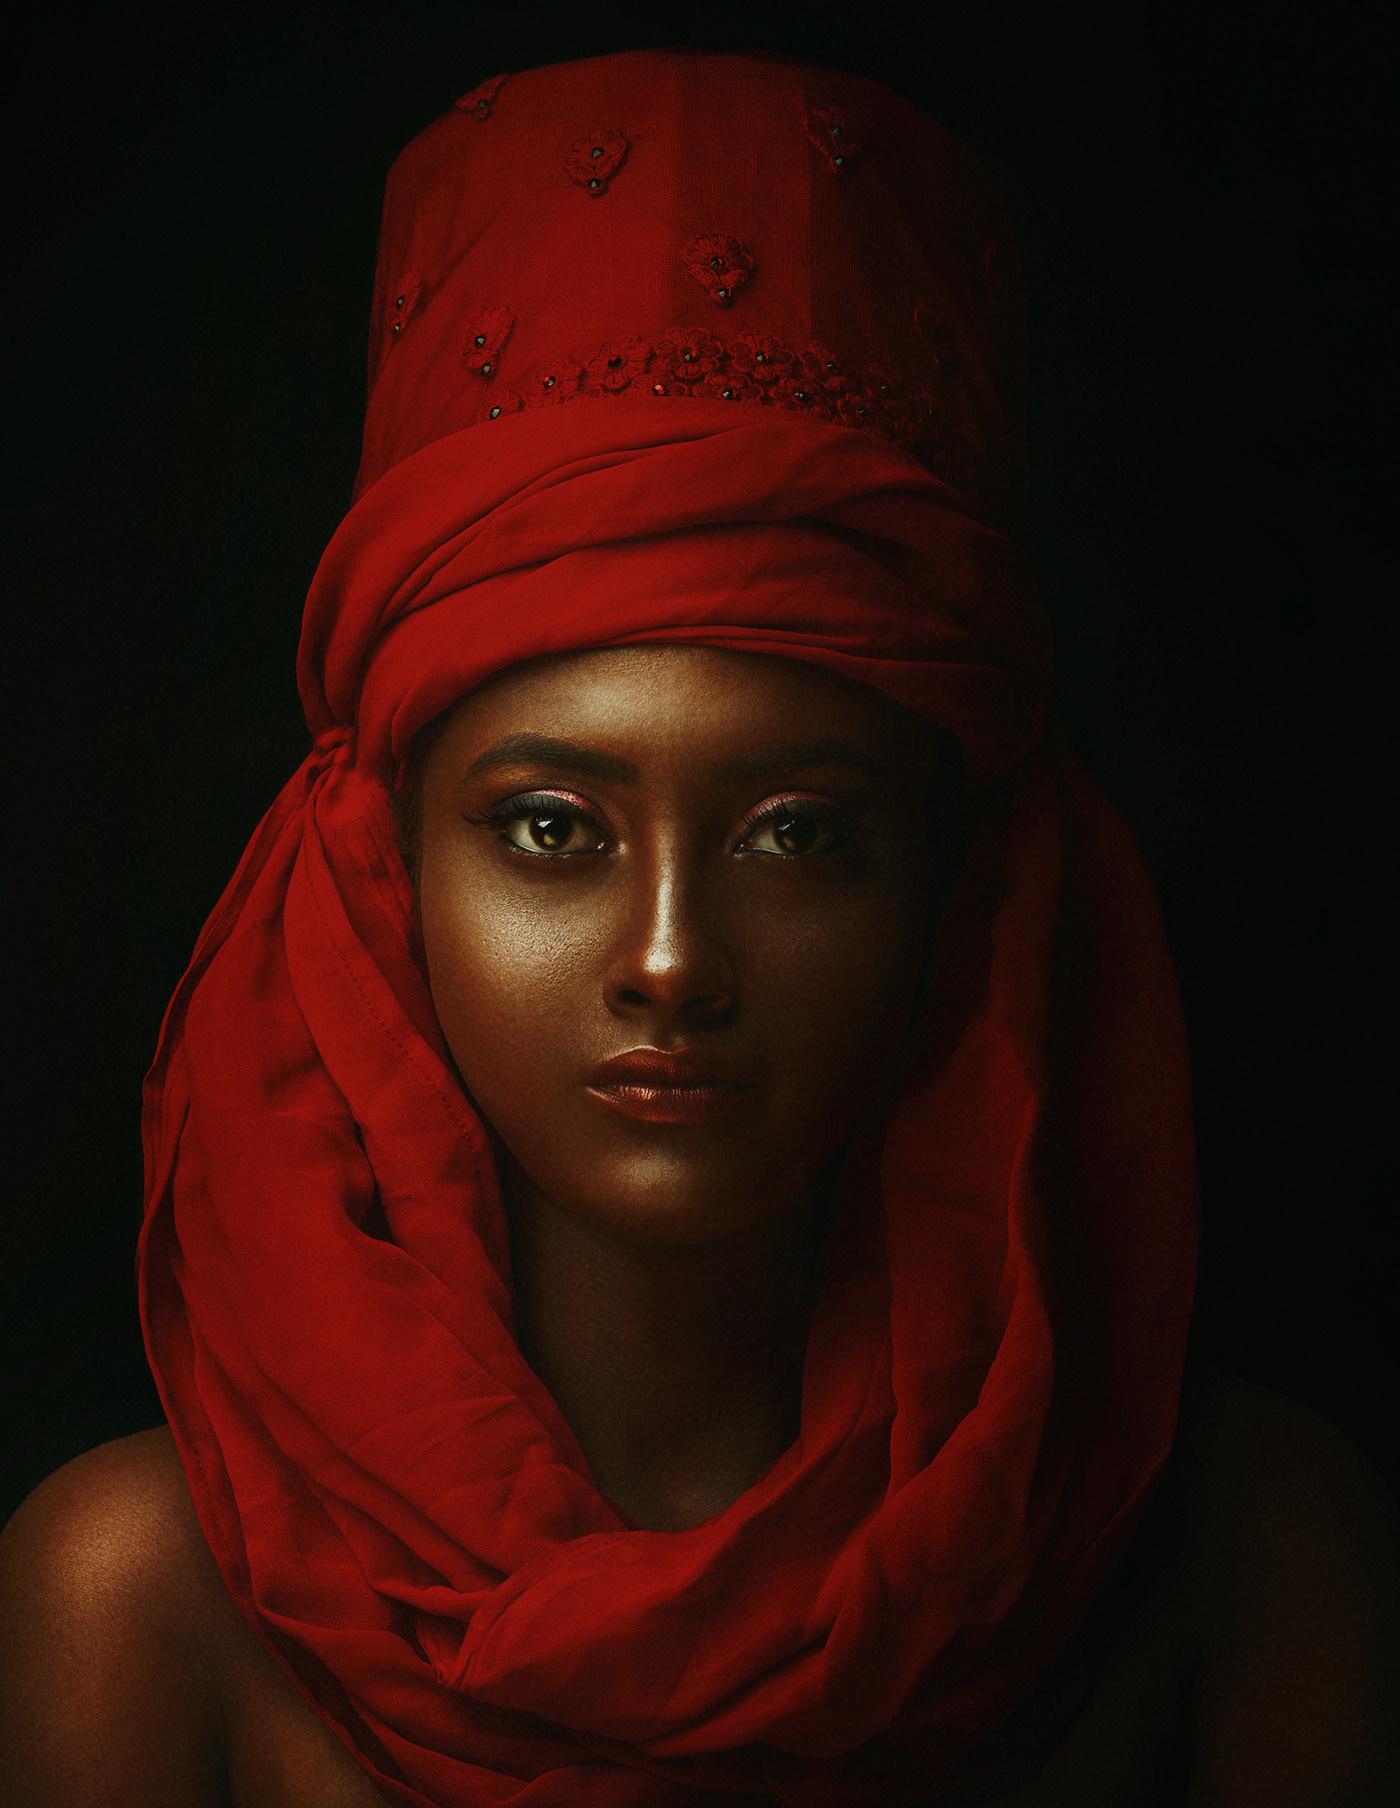 portrait photography red tone by debarghya mukherjee